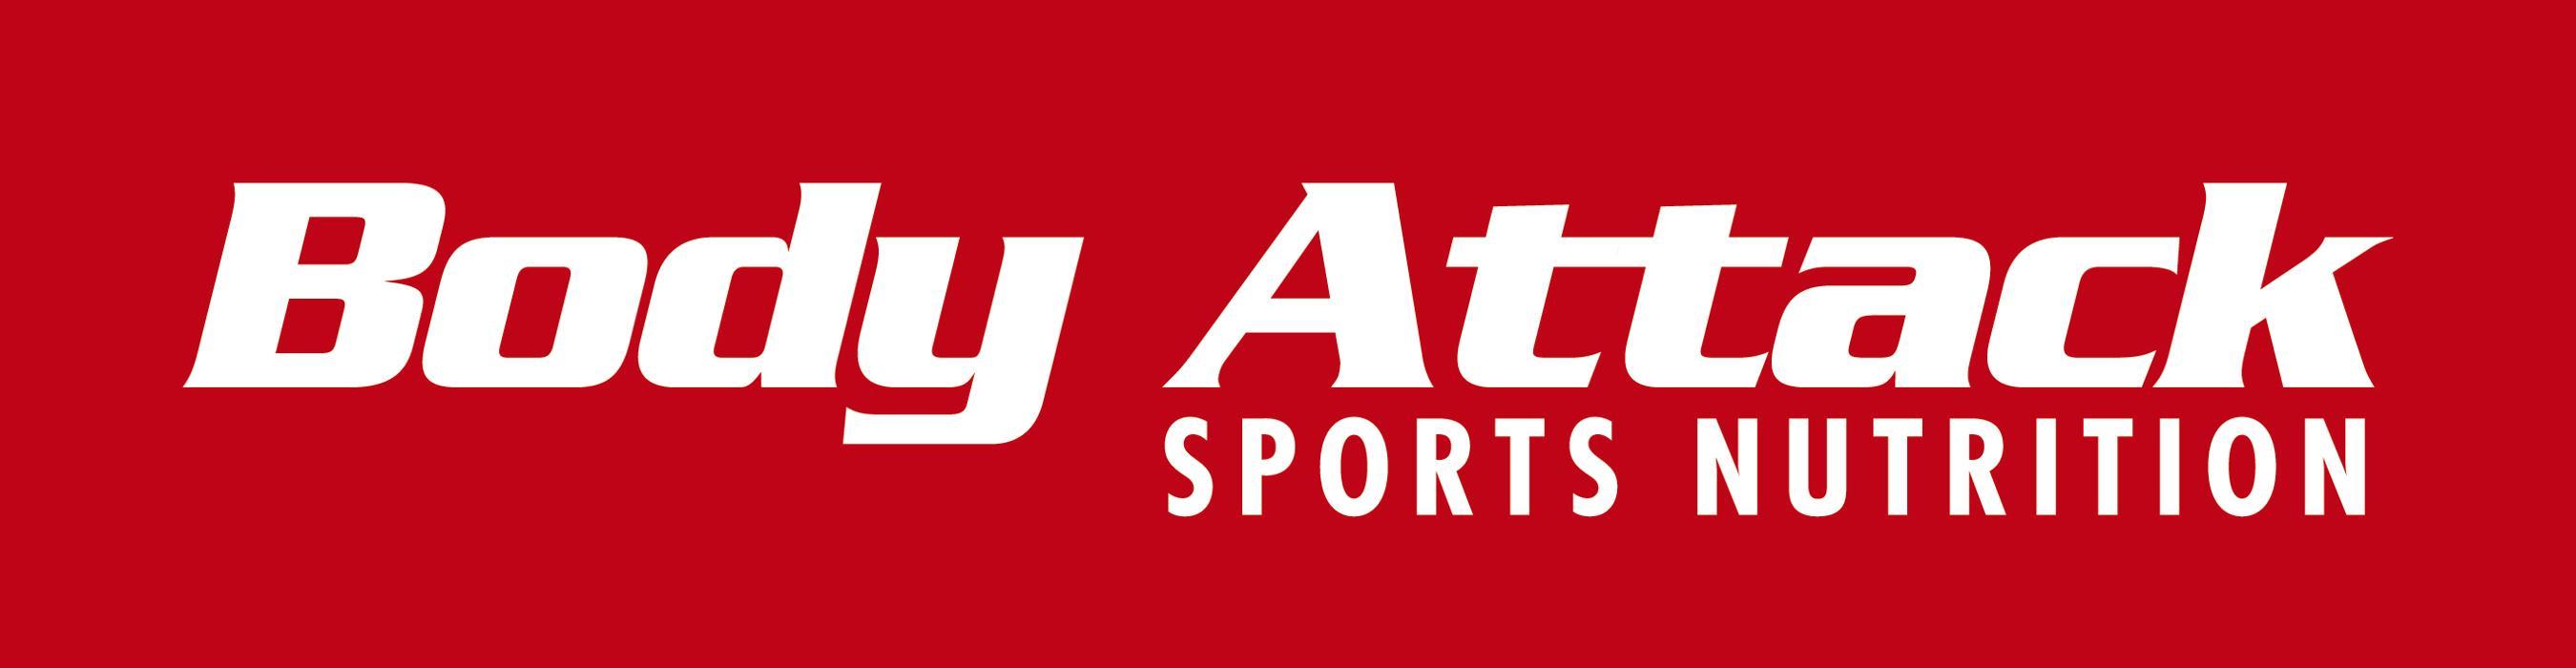 Body Attack Premium Store Kassel